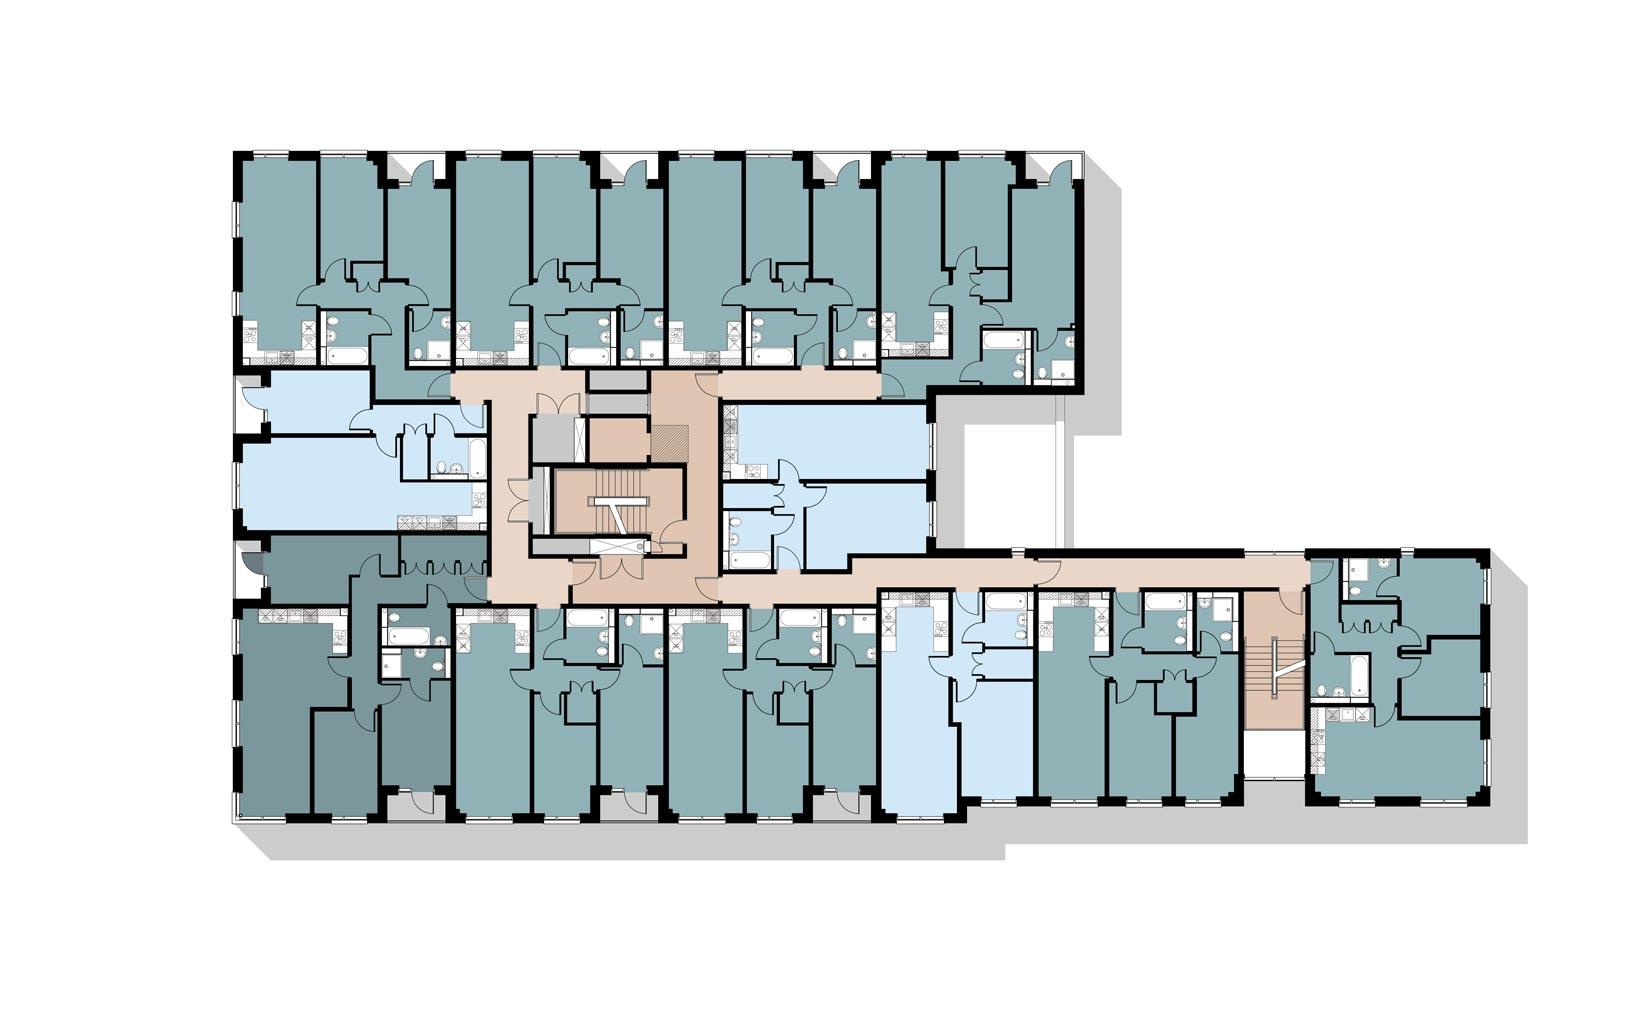 Halo, Simpson Street, Manchester, Second Floor Plan